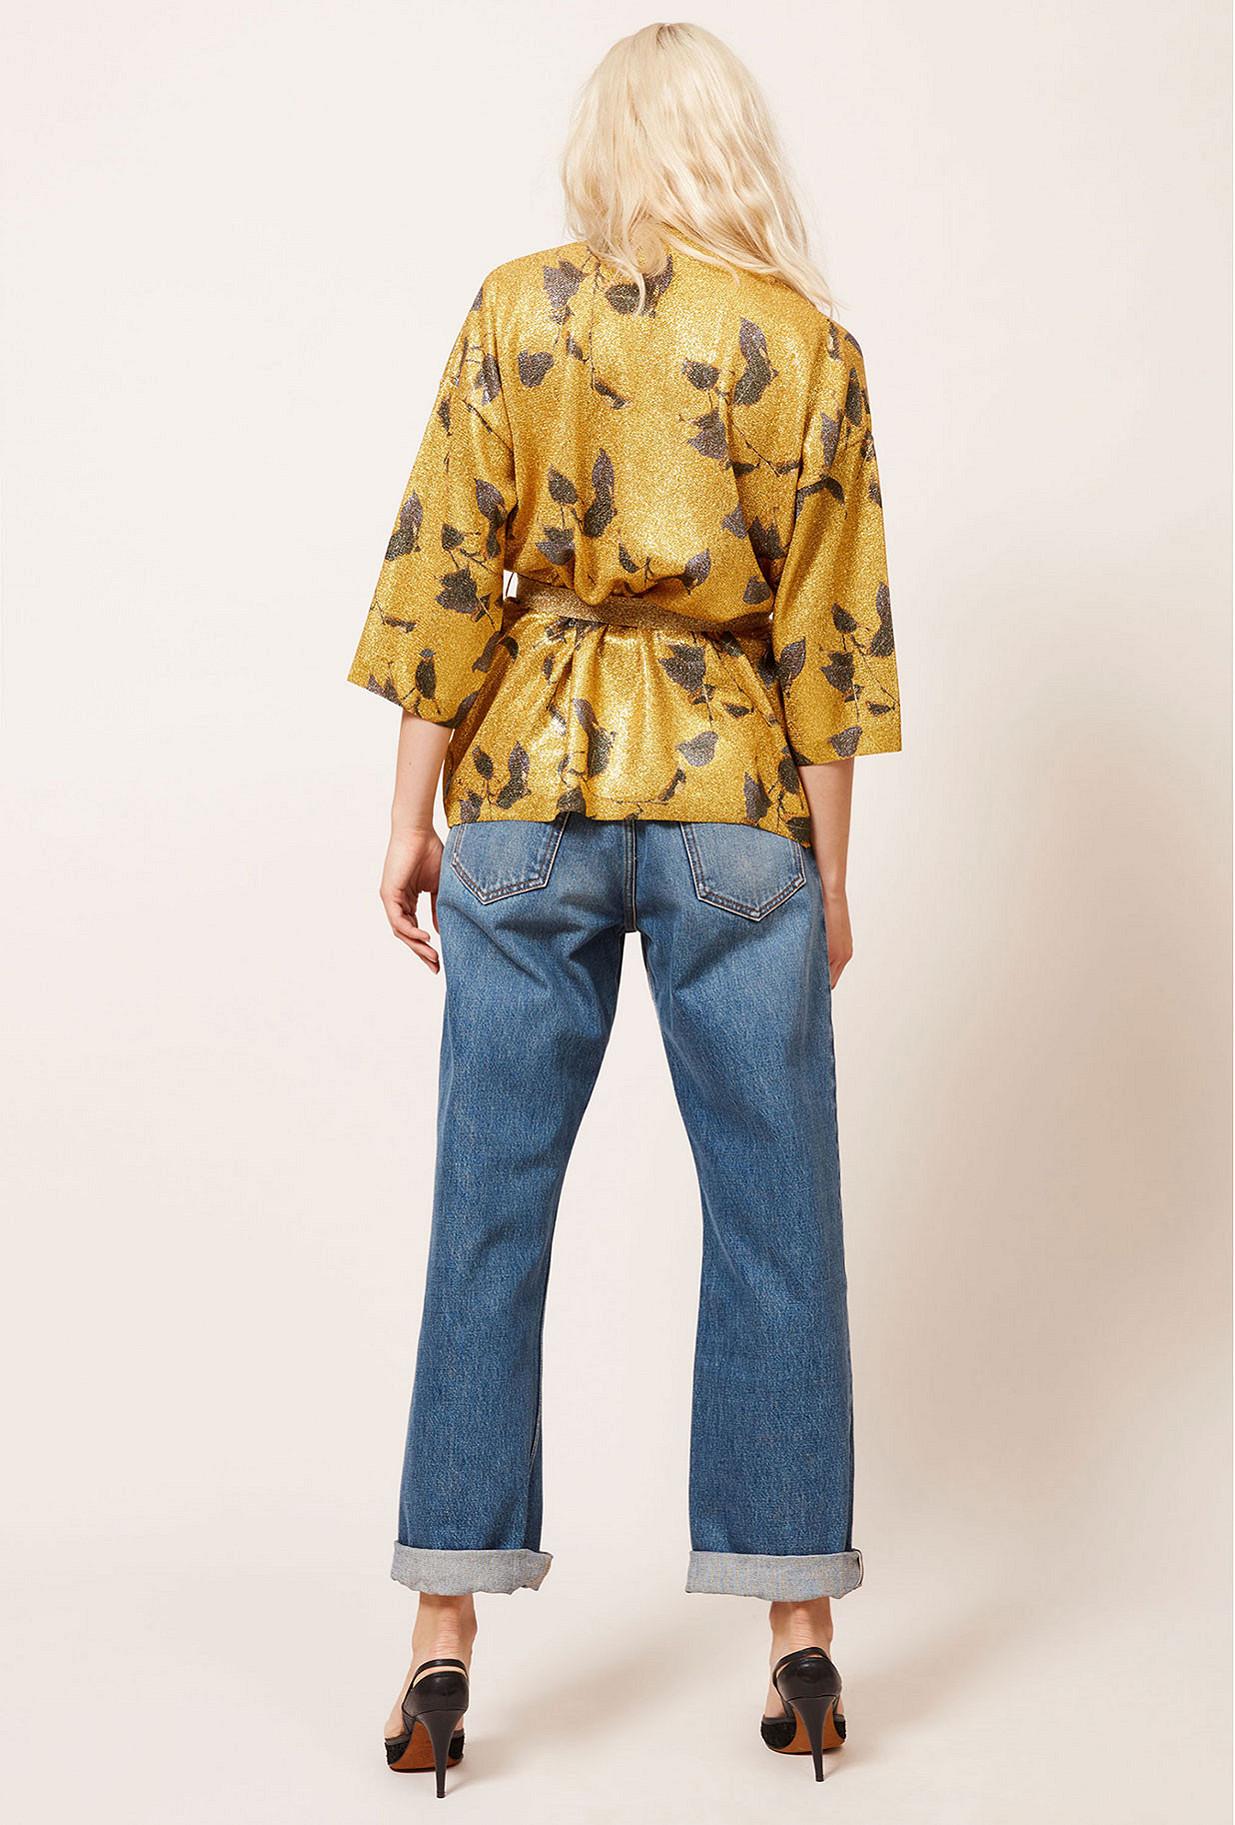 Paris clothes store Kimono  Grimmy french designer fashion Paris